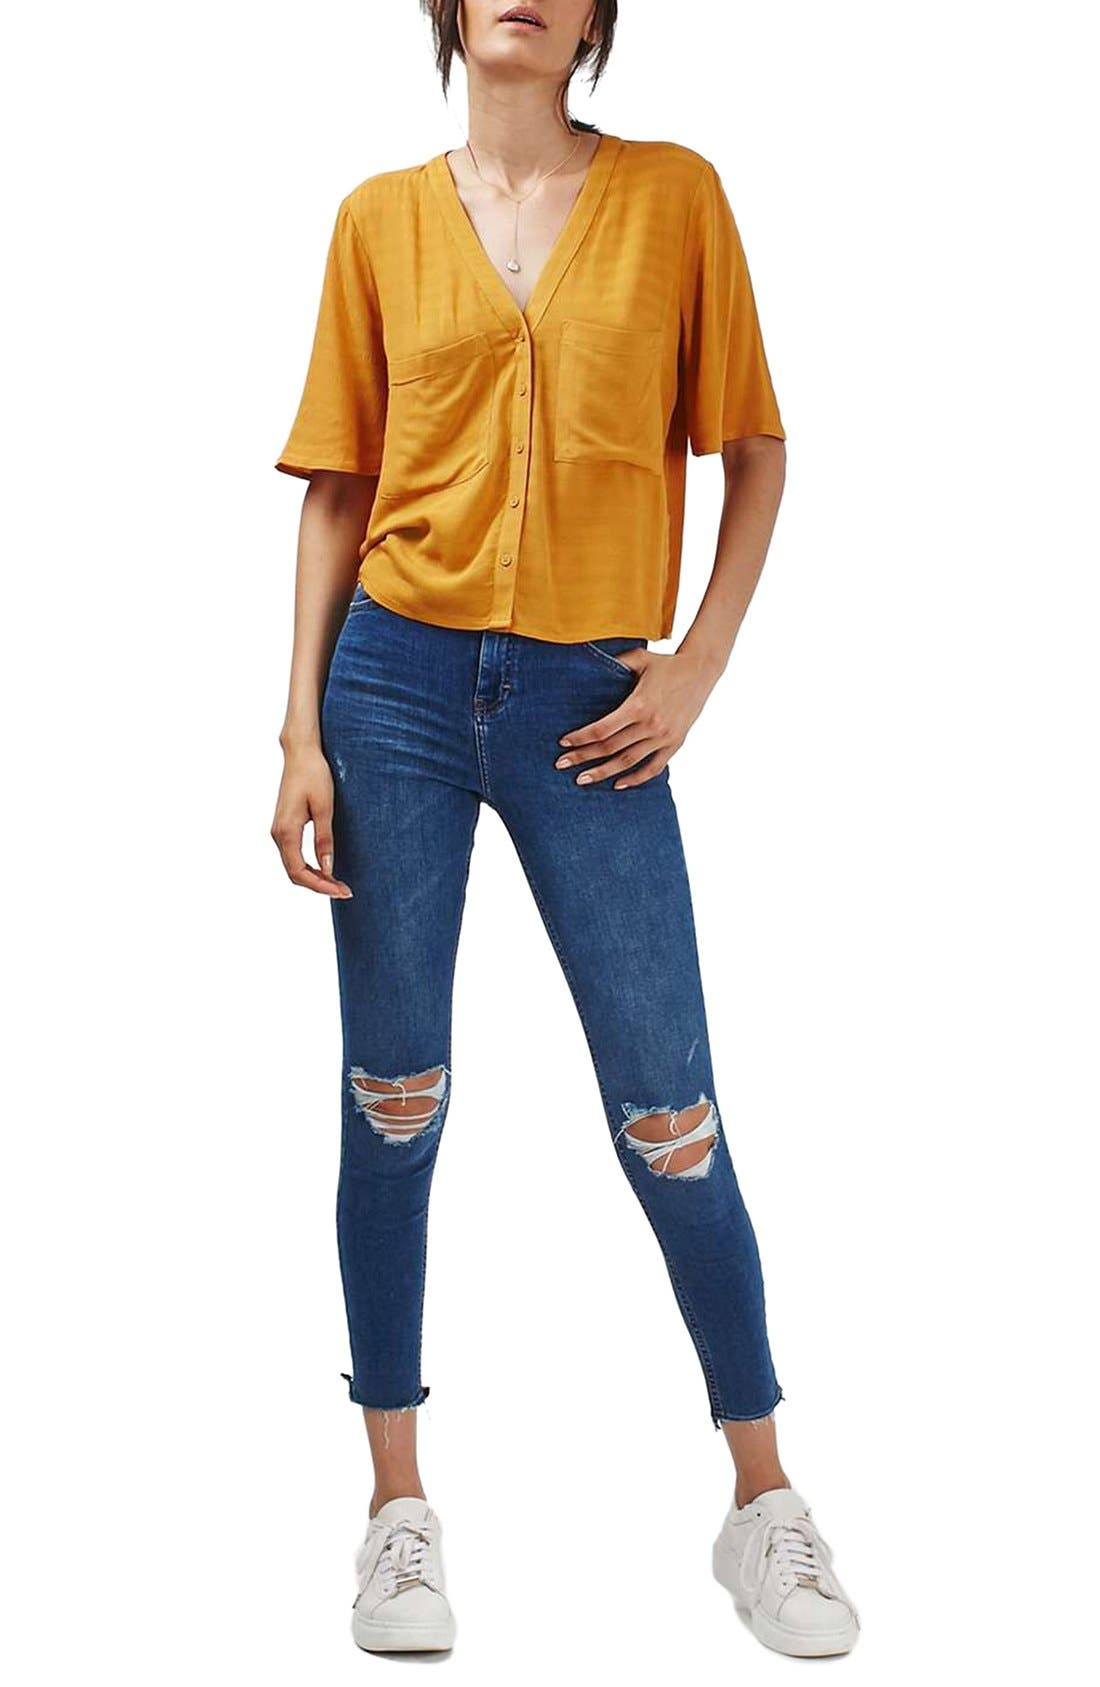 Alternate Image 2  - Topshop 'Holly' Short Sleeve V-Neck Shirt